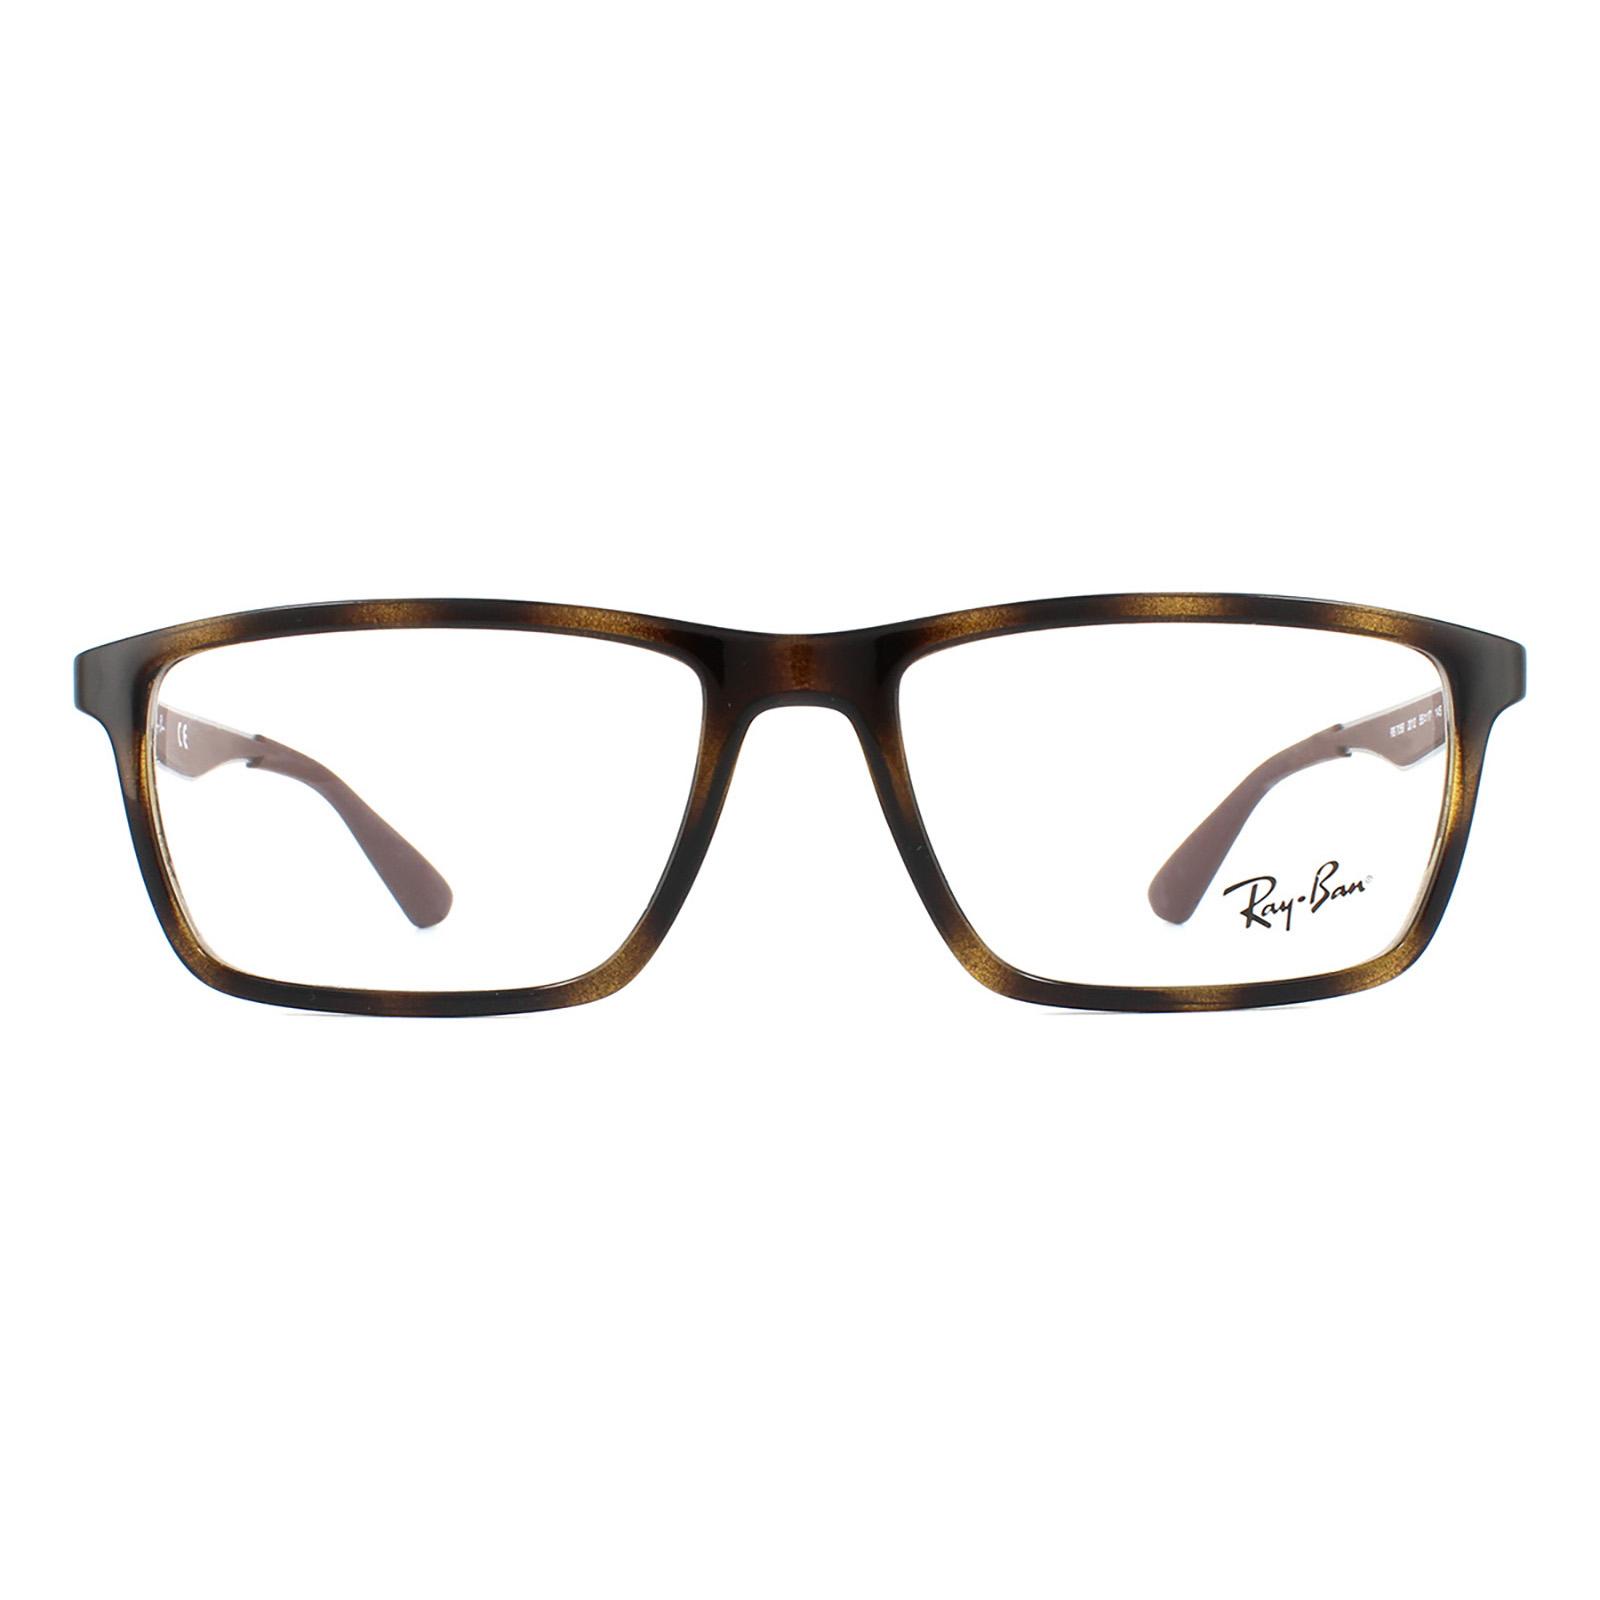 Ray-Ban Glasses Frames 7056 2012 Shiny Havana Men 53mm | eBay